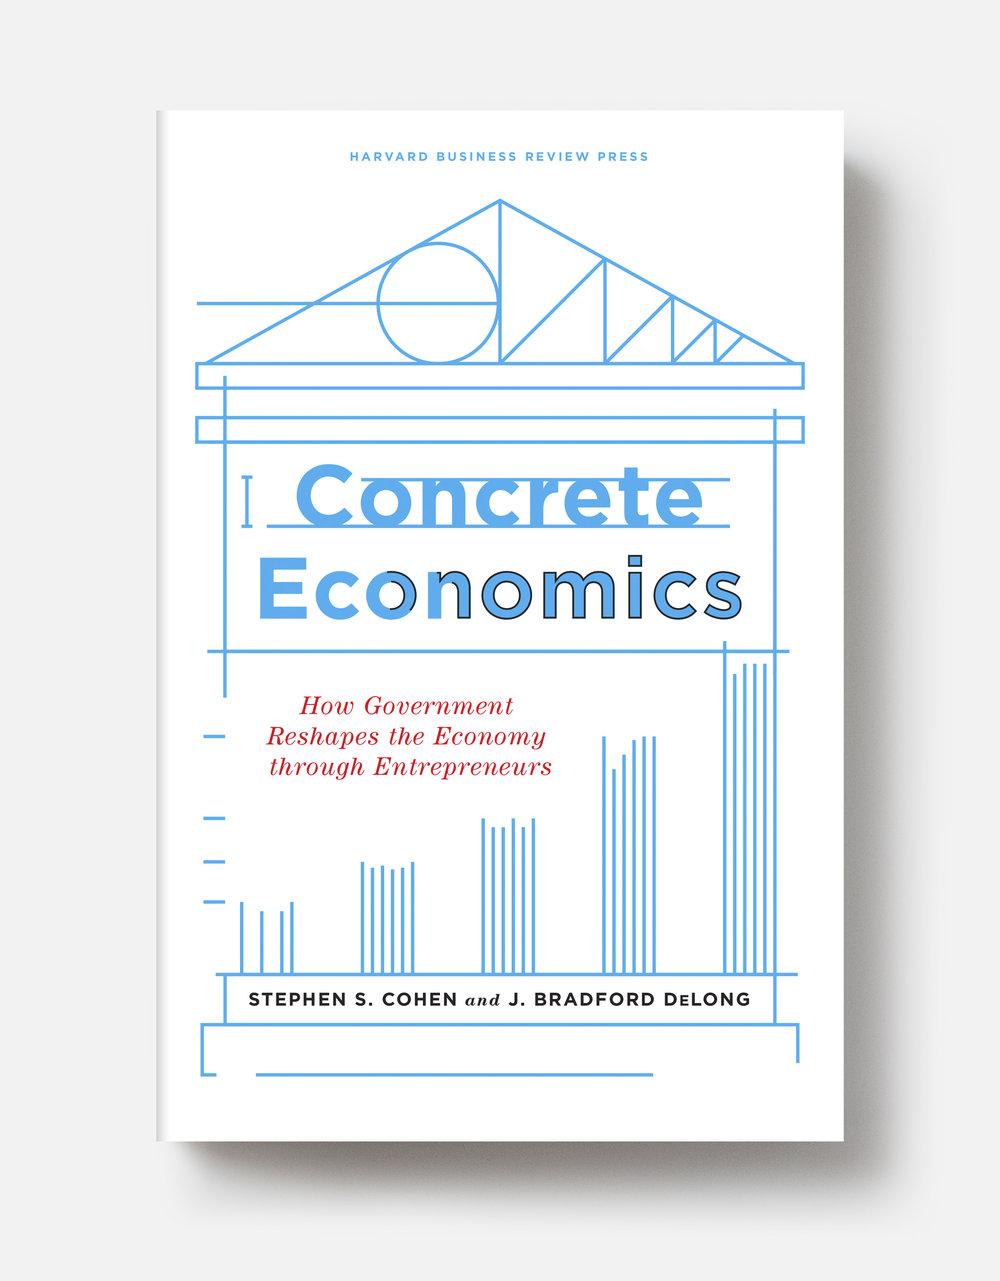 Concrete Economics mockup.jpg